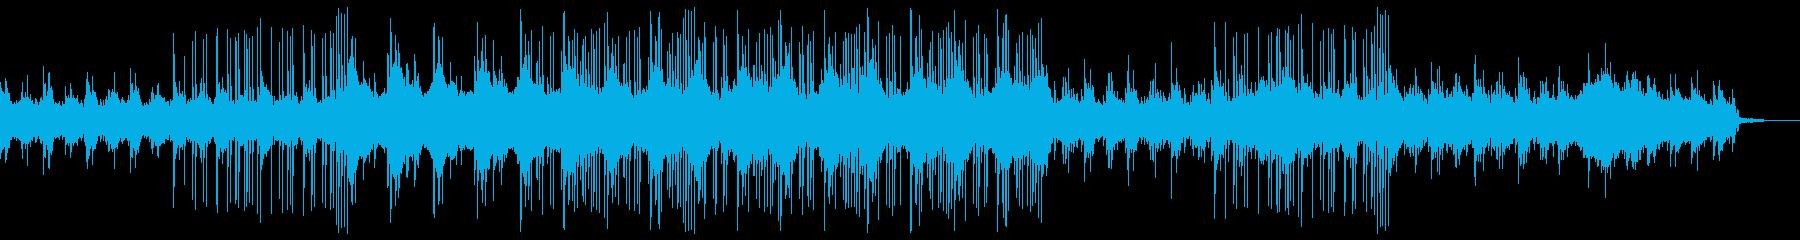 NewAge・アンビエント・劇伴の再生済みの波形